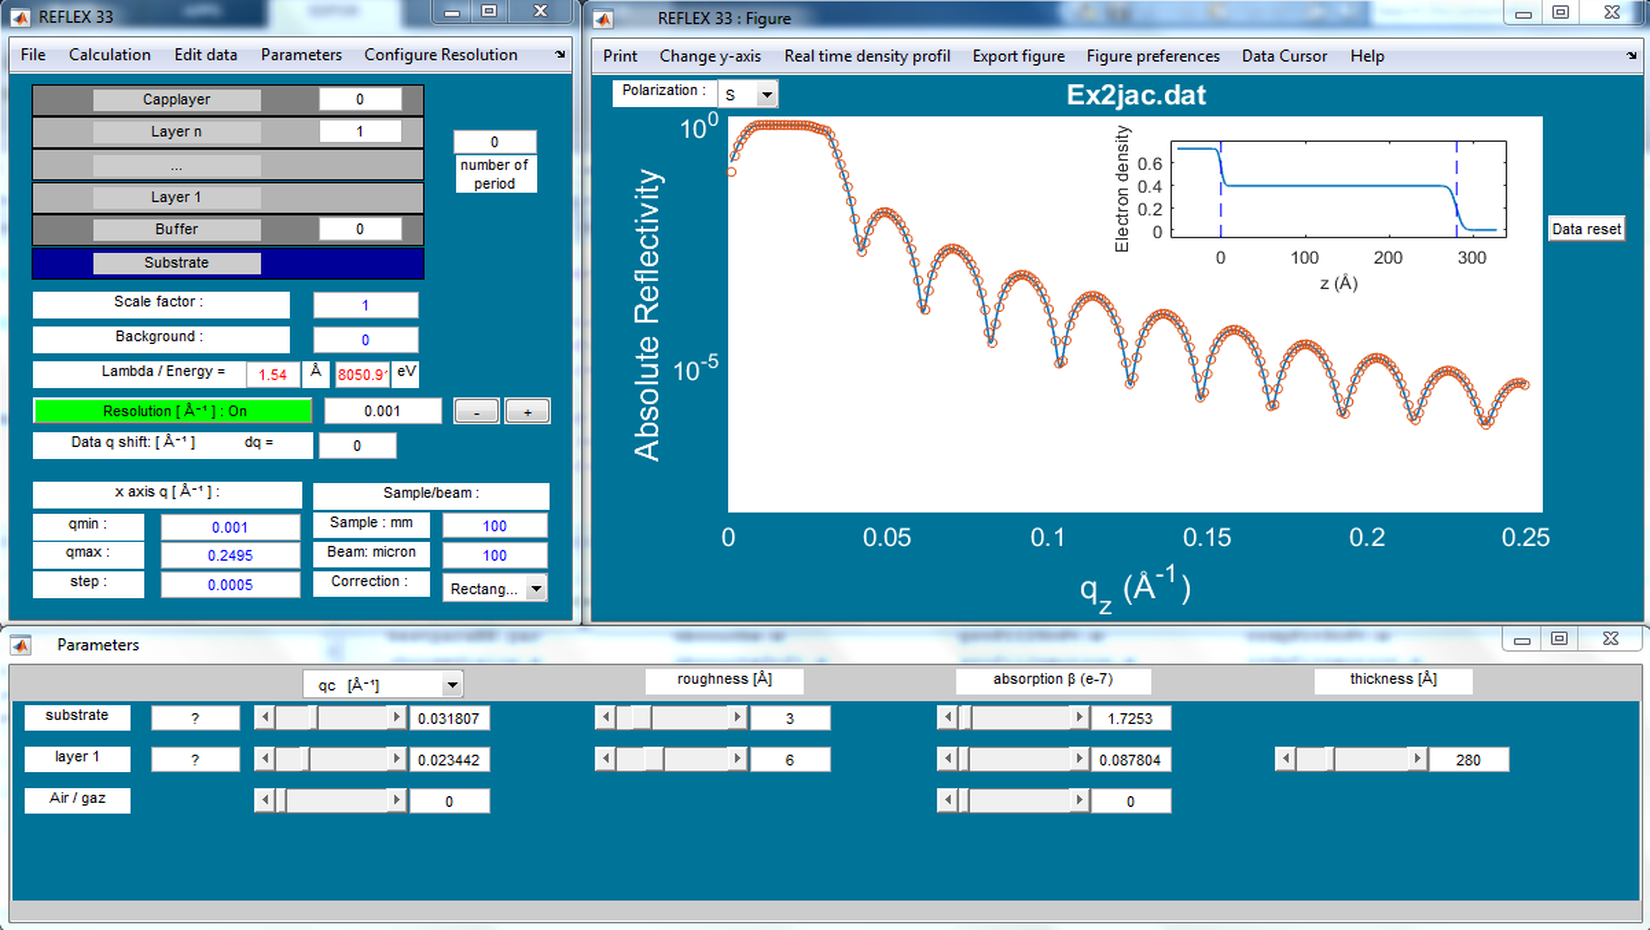 REFLEX software: X-rays and Neutron reflectivity data analysis